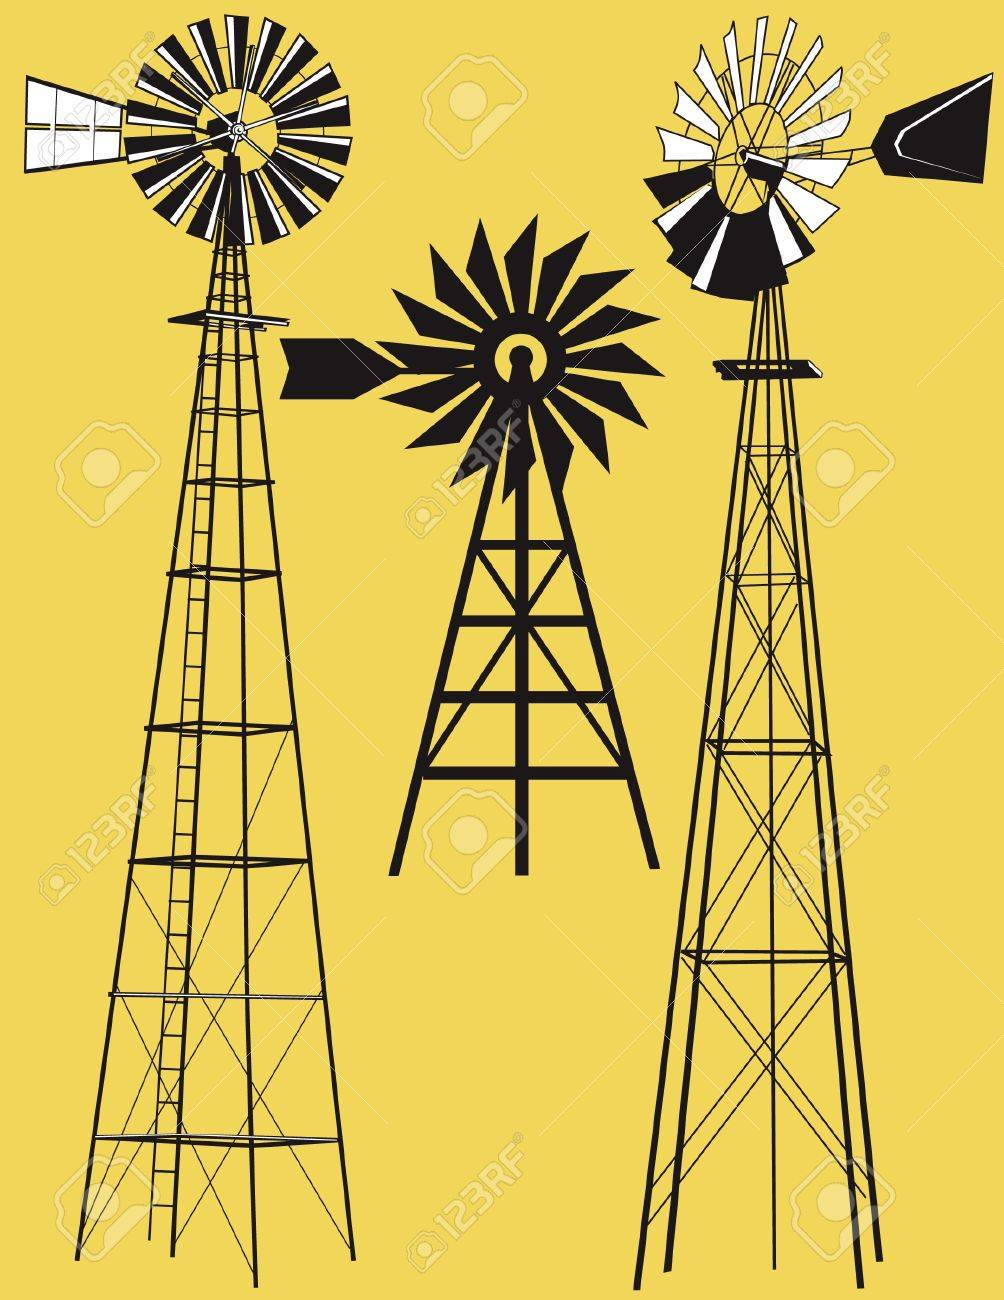 Three Windmills Stock Vector - 12891072